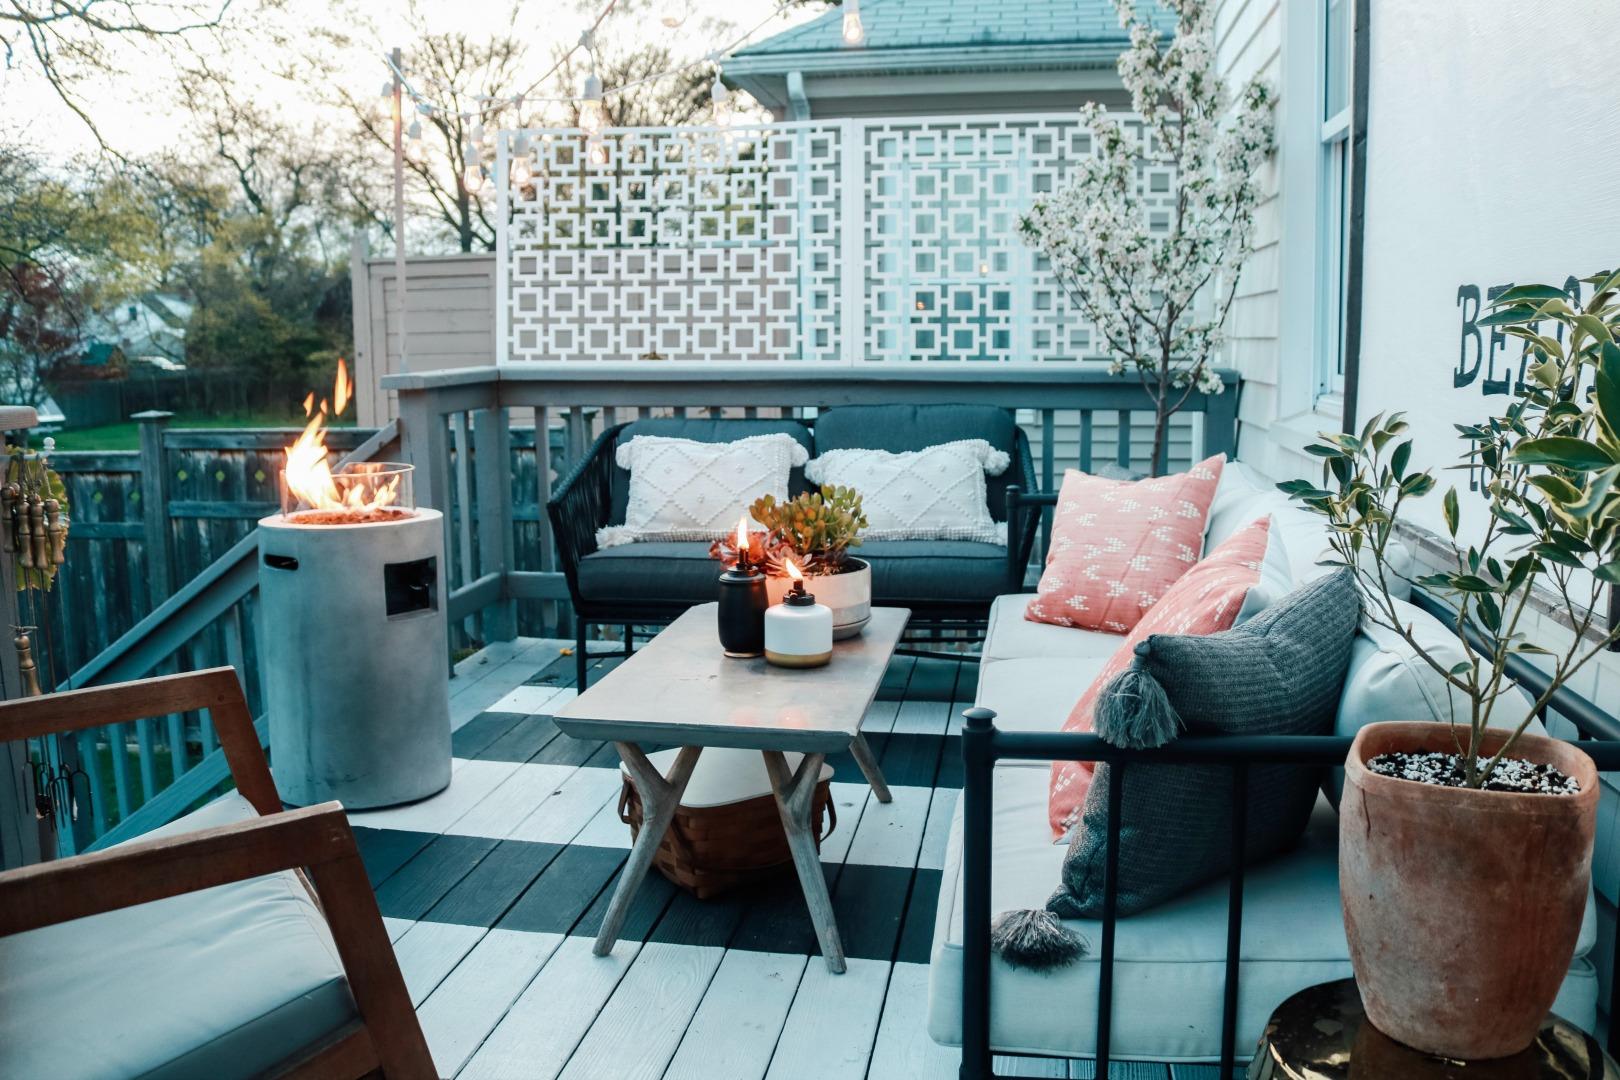 7 Things Every Backyard Needs!